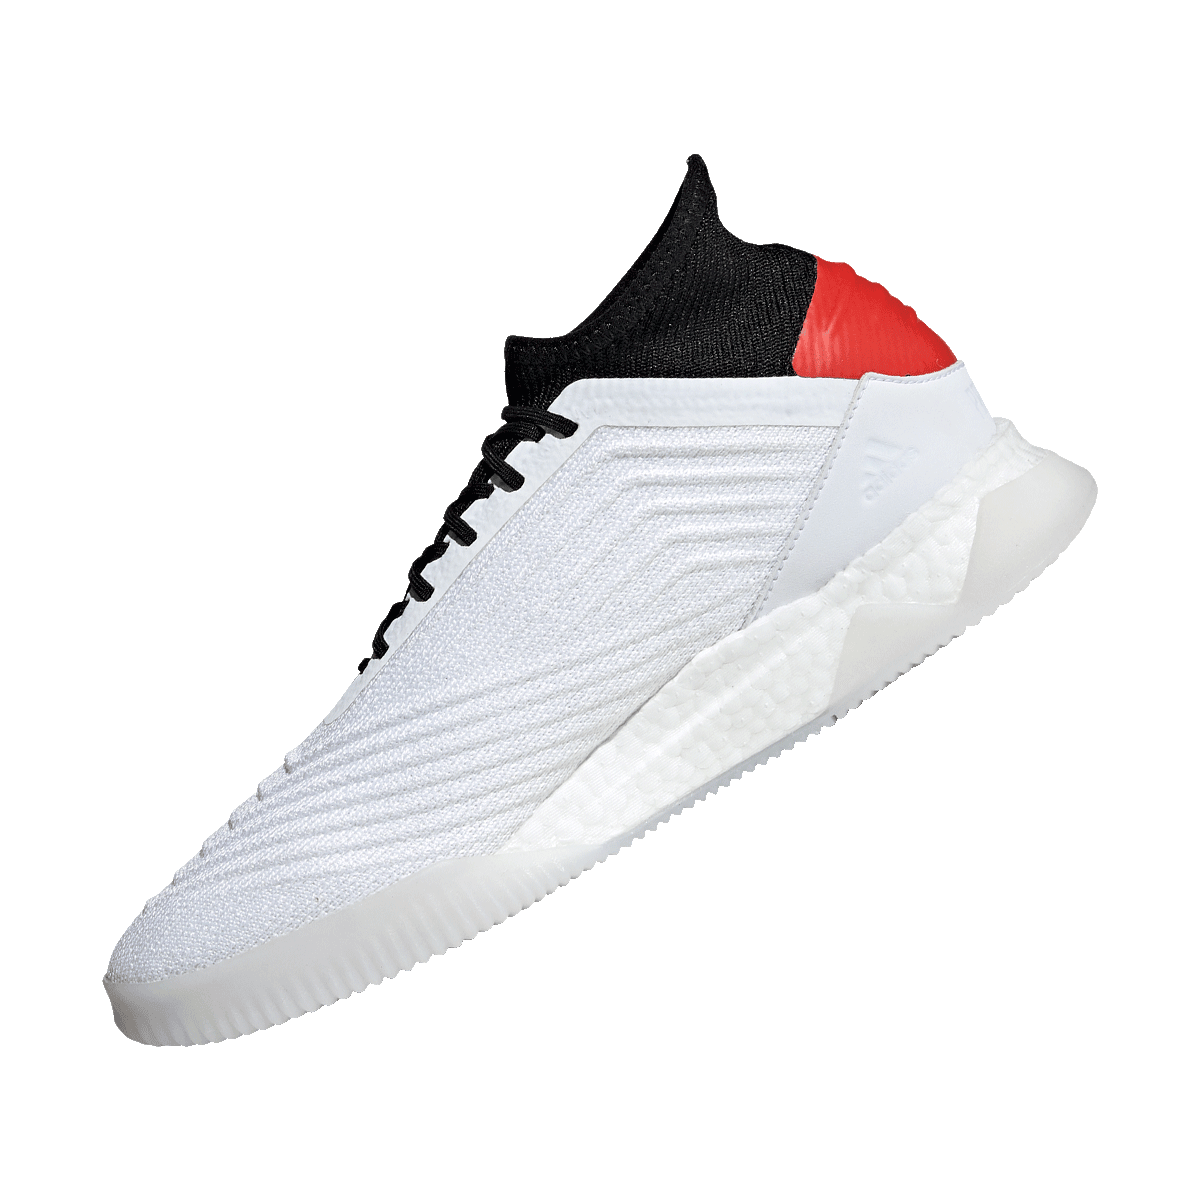 adidas Schuh Predator 19.1 TR weißrot